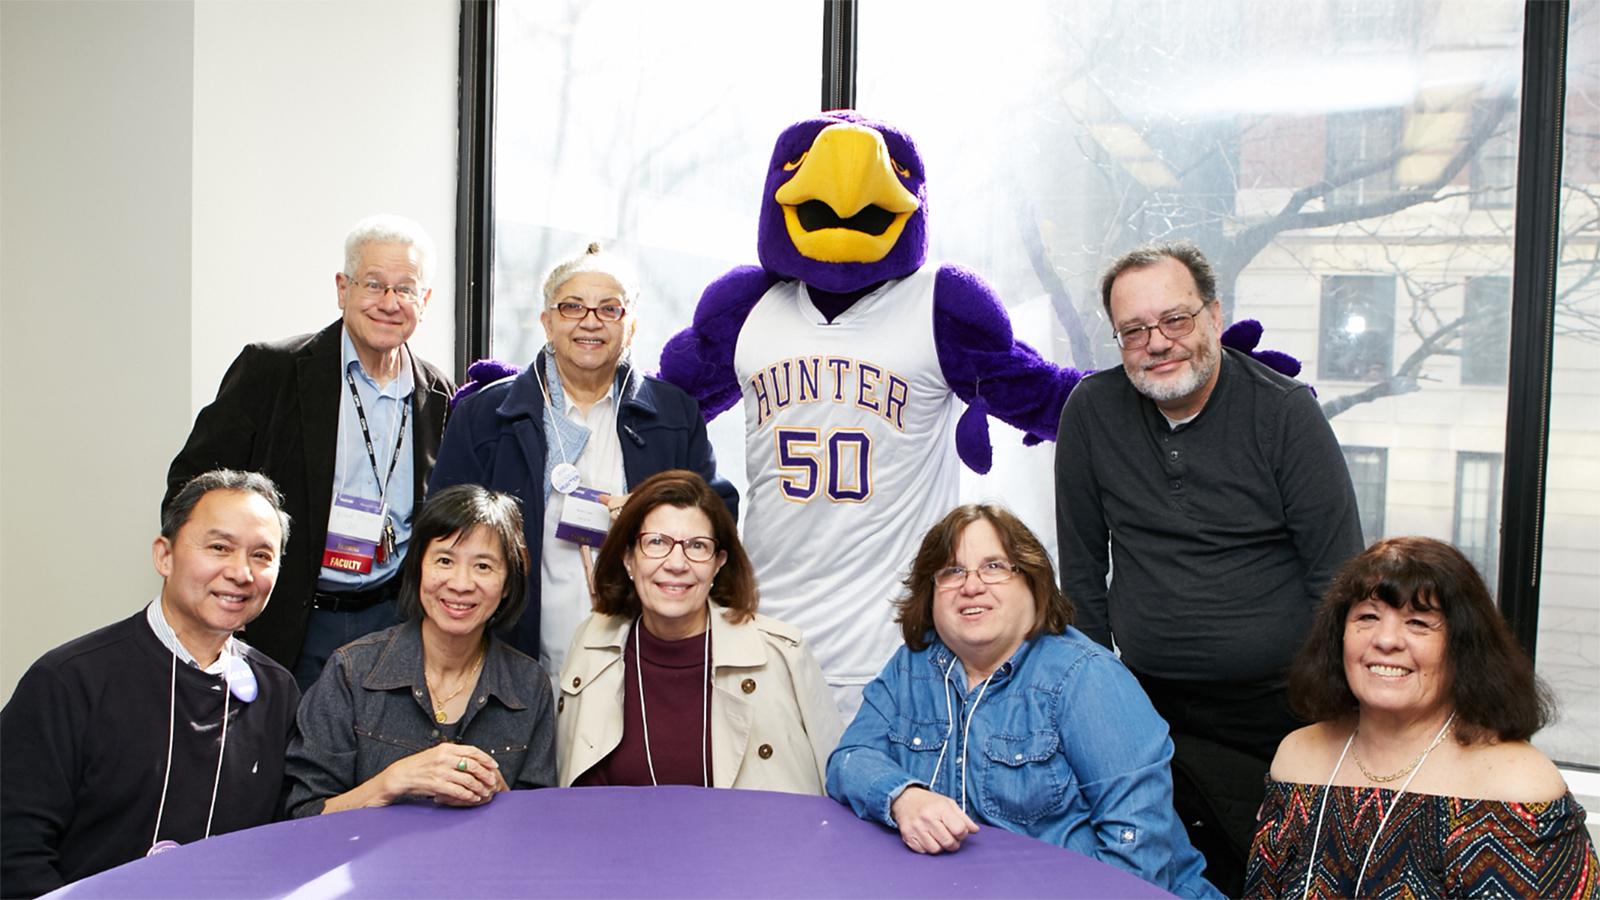 Photo - Senior Citizen Auditors pose with the Hunter Hawk